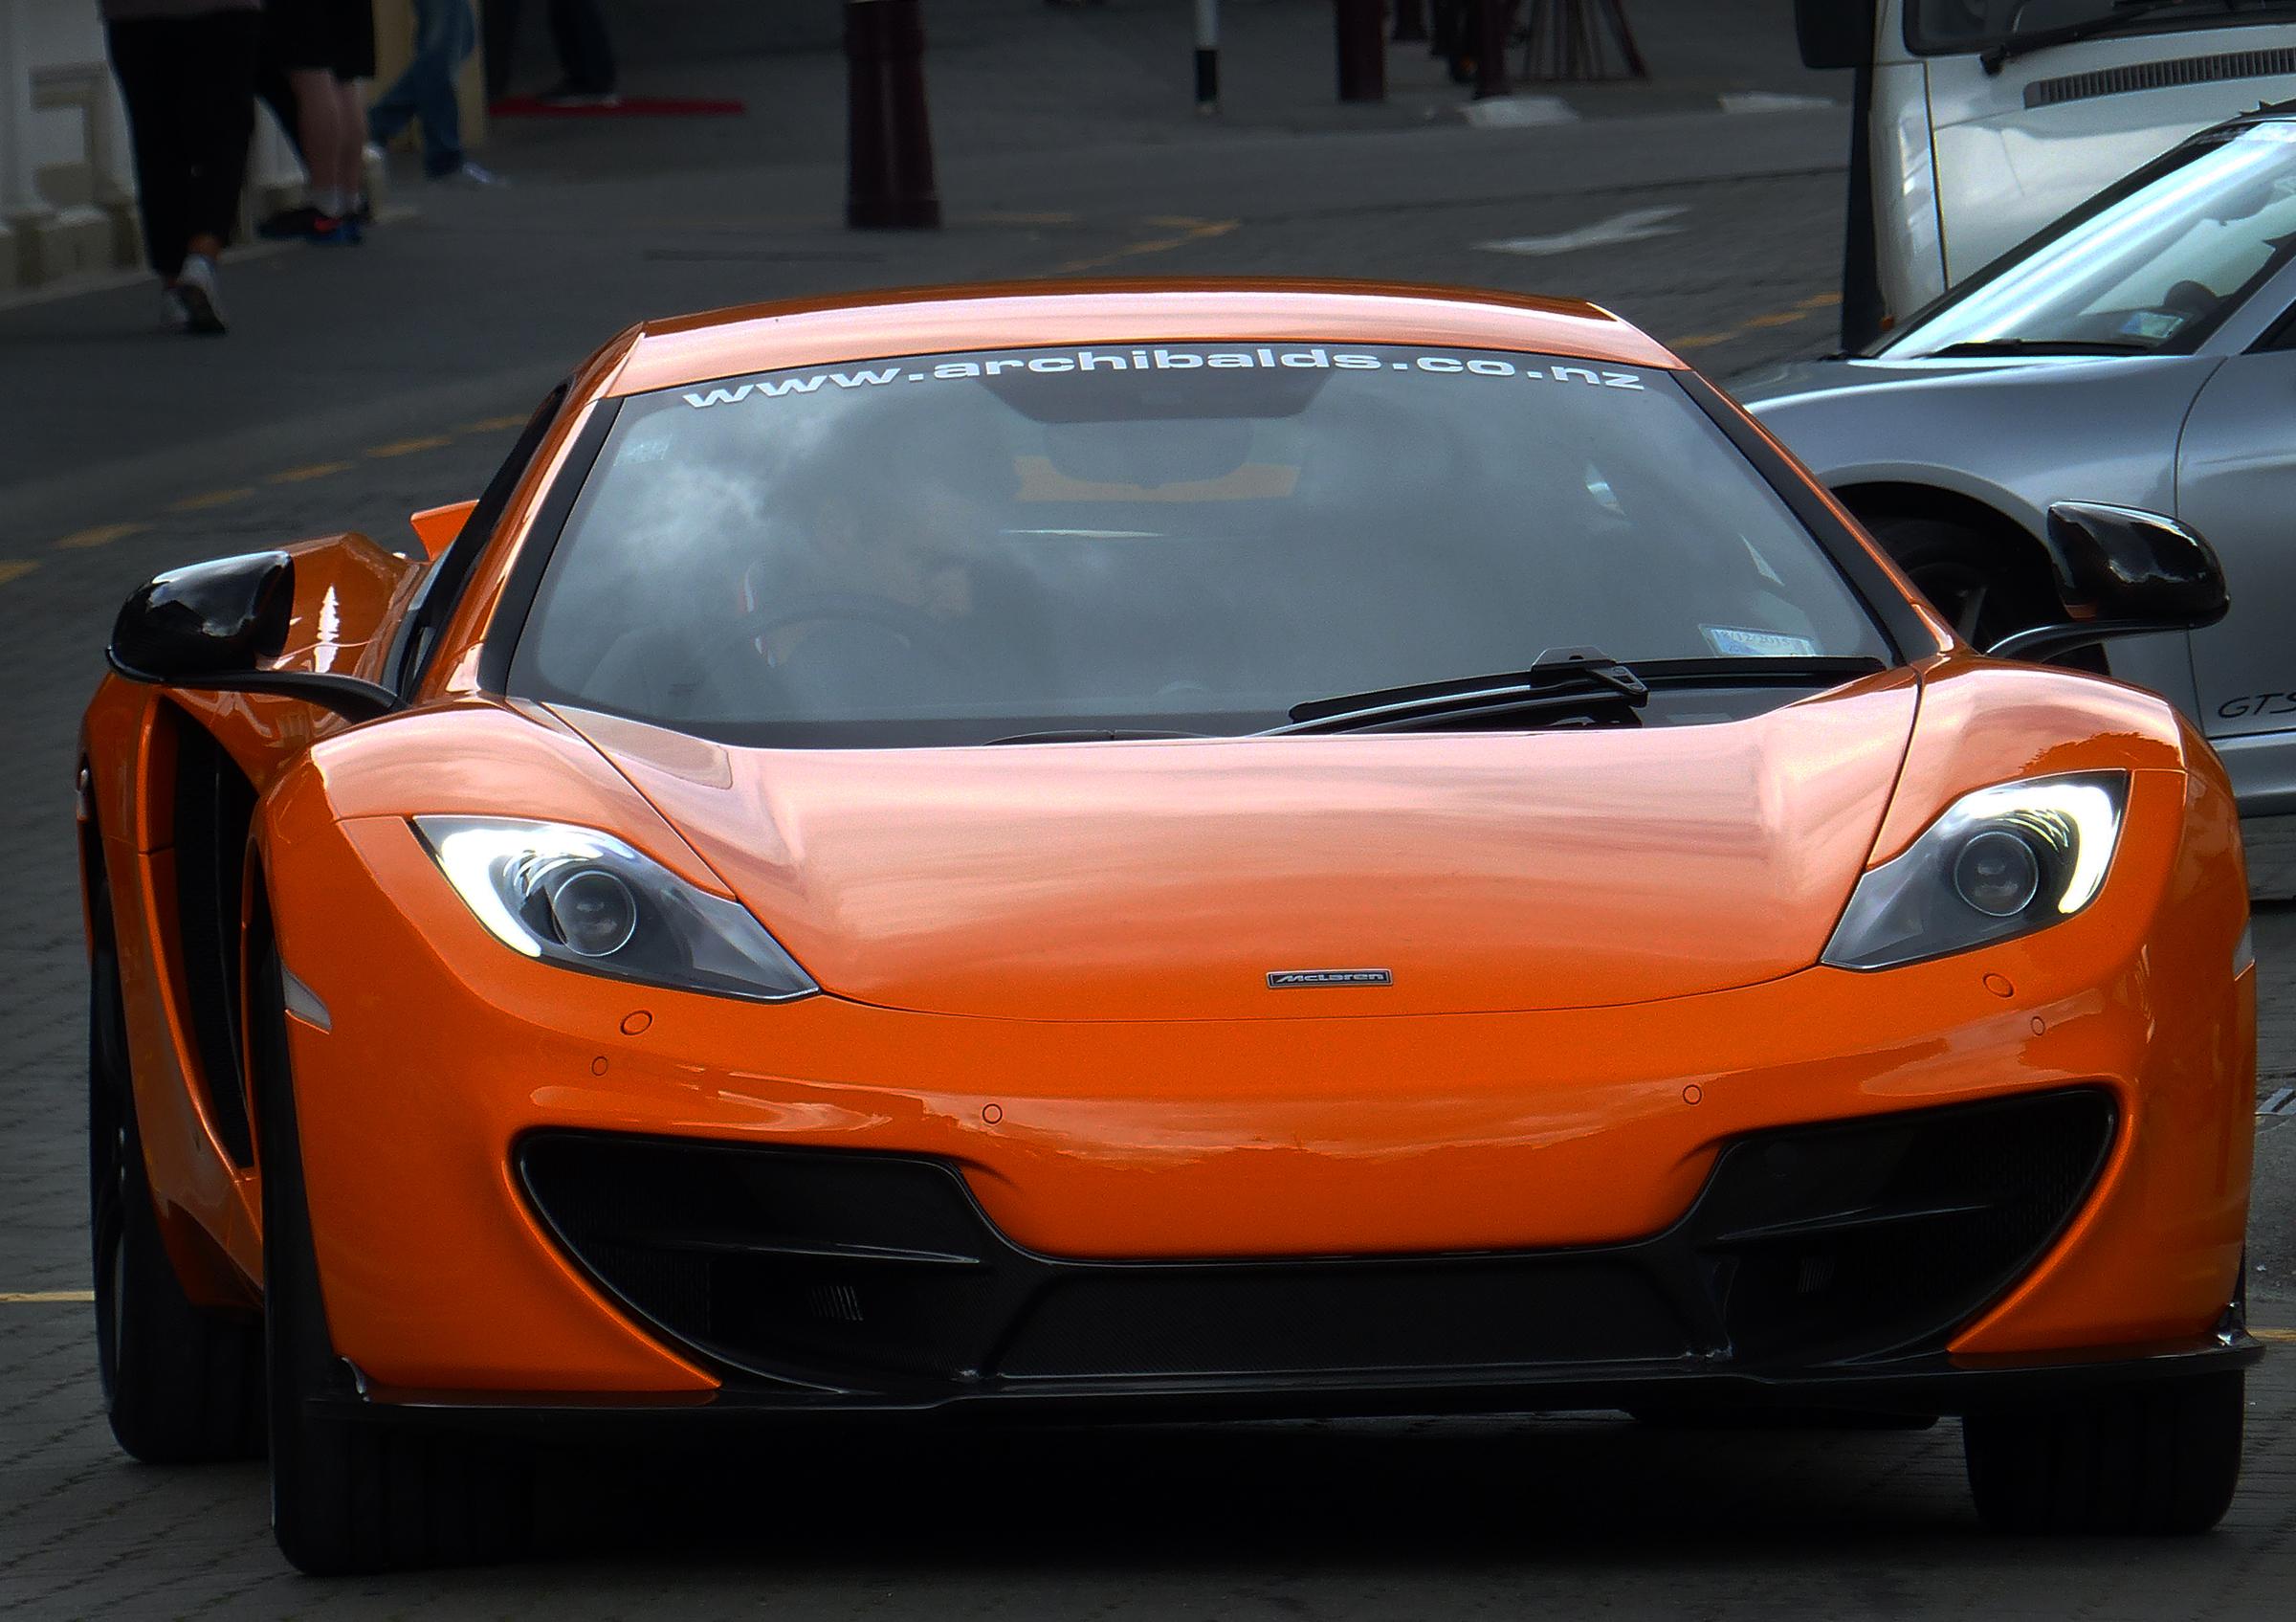 Free Images Orange Sports Car Supercar Cars Sportscars - Sports cars mclaren